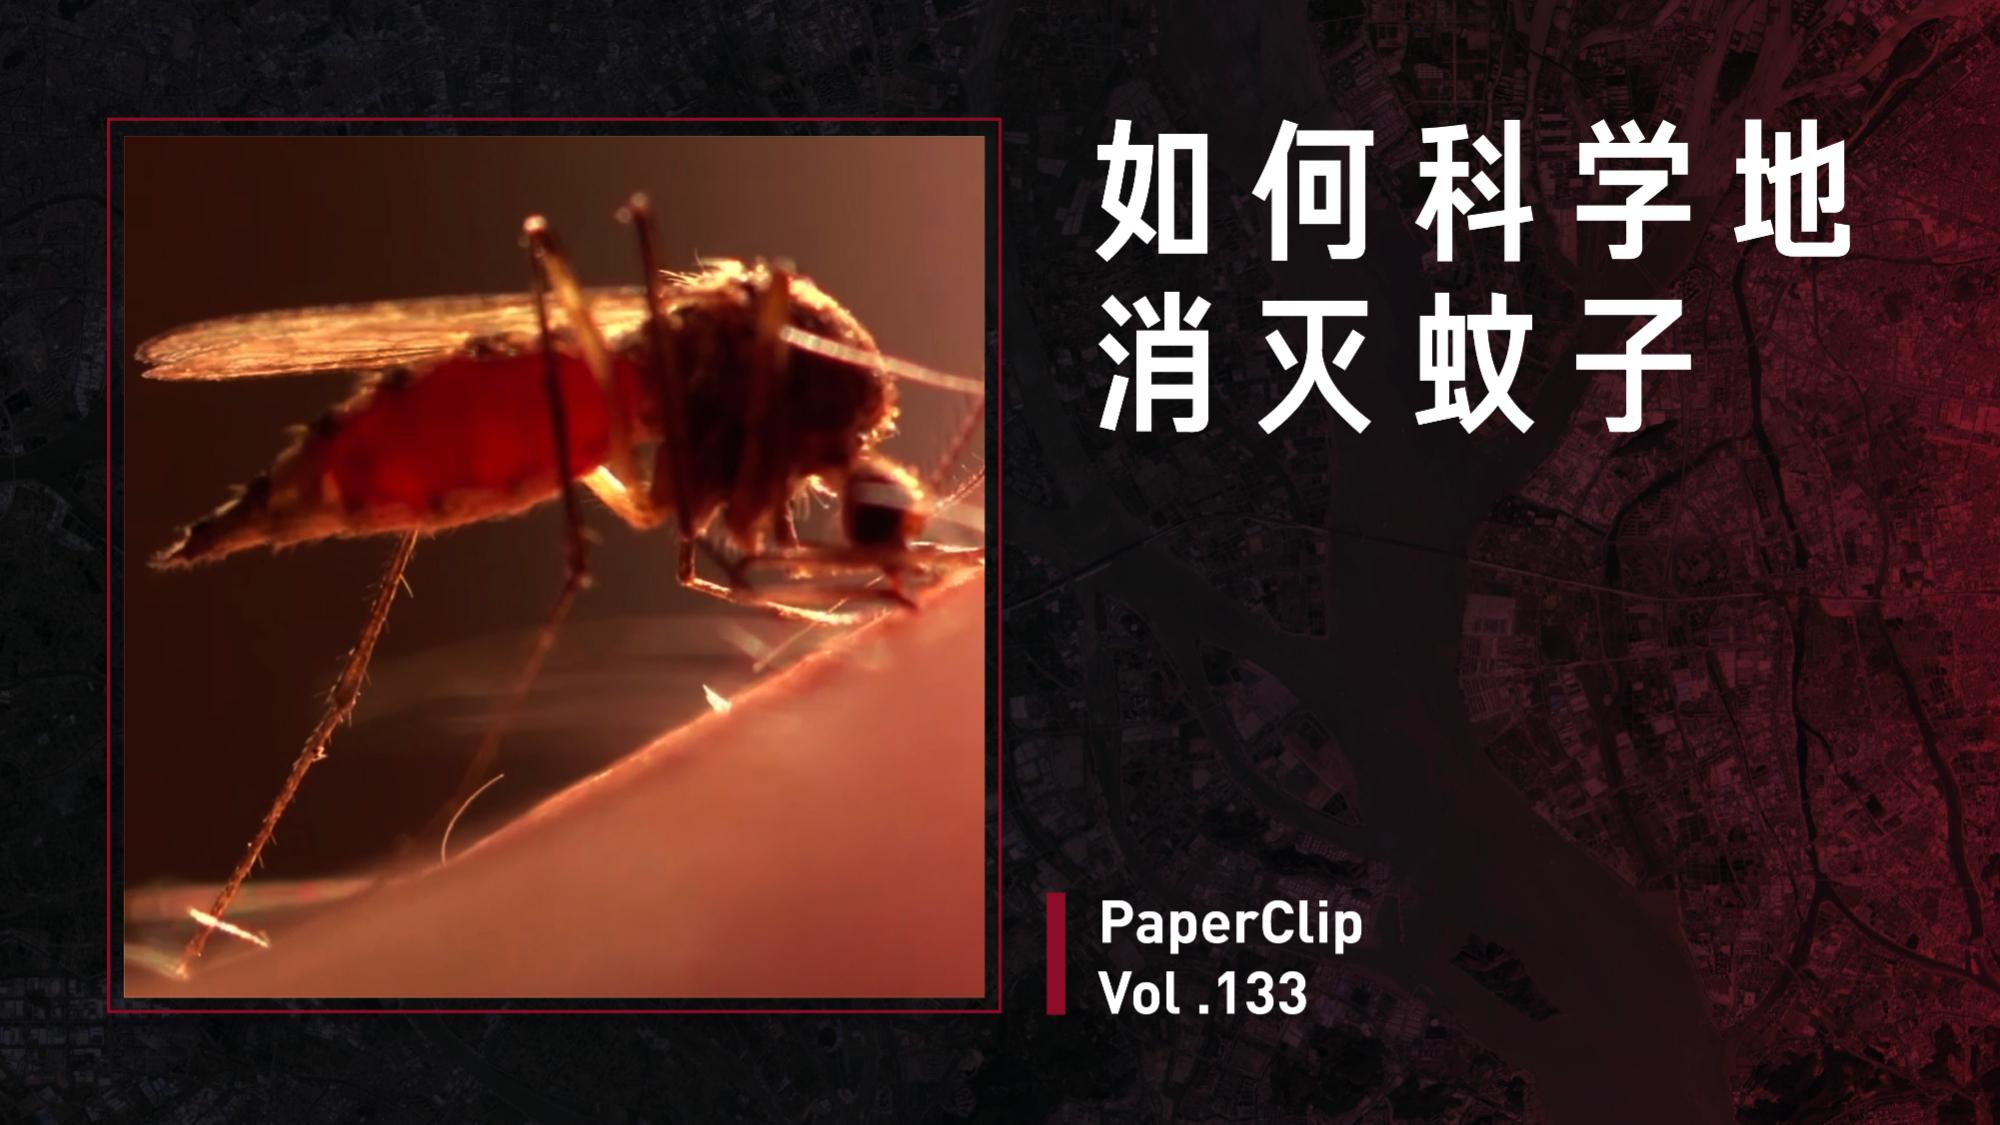 Vol.133 如何科学地消灭蚊子